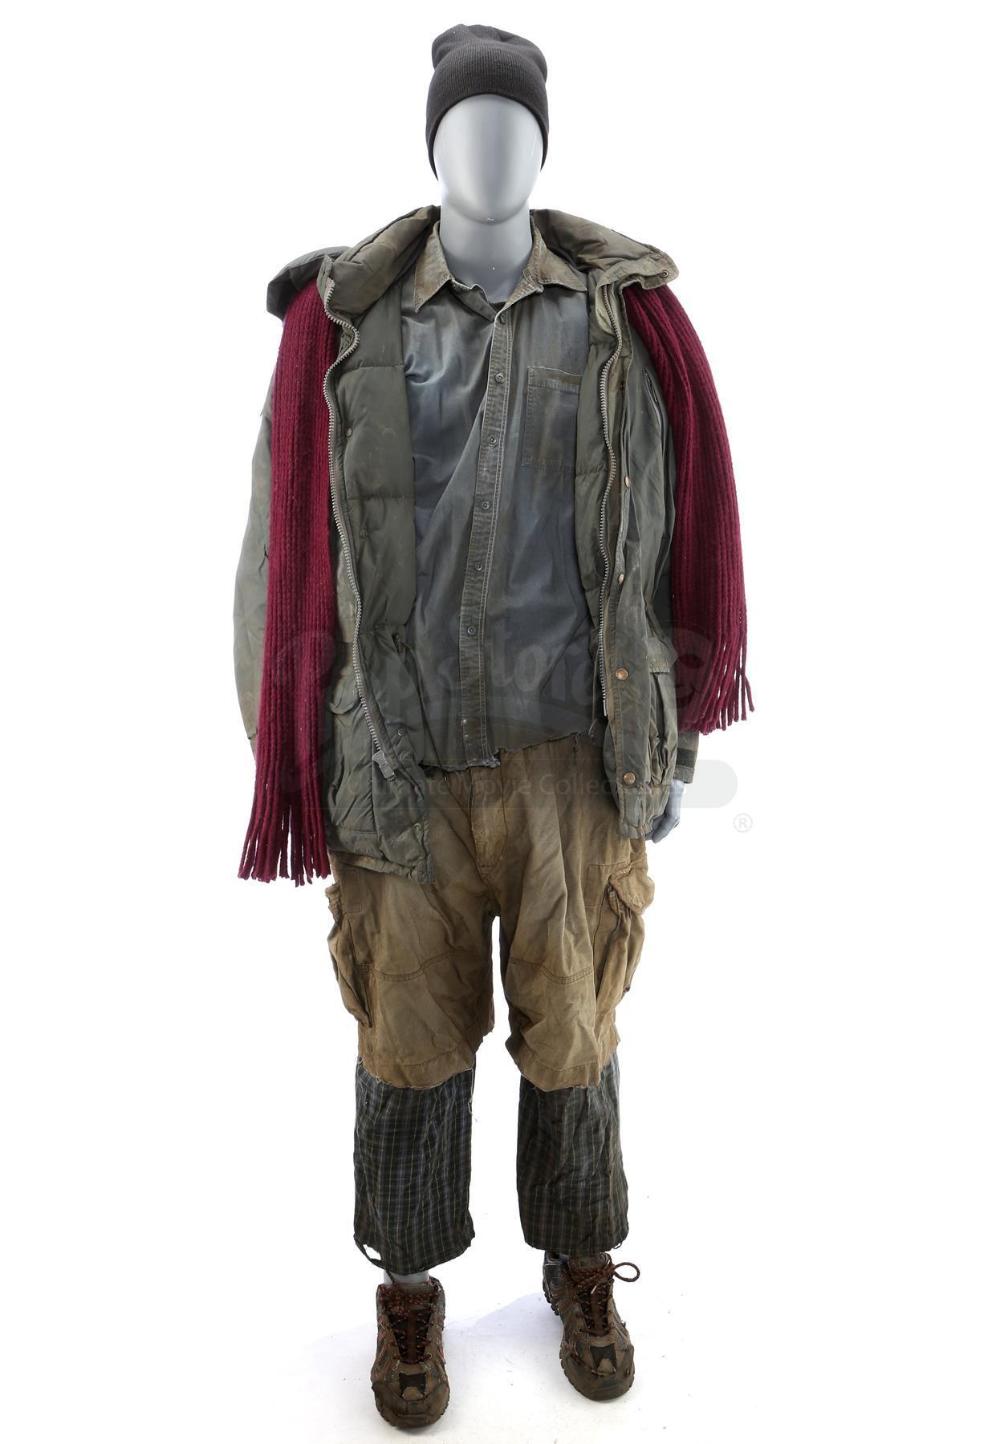 Lot 136 John Wick Chapter 3 Parabellum Distressed Bowery Homeless Man Stunt Costume Price Estimate Homeless Man Mens Costumes Costumes